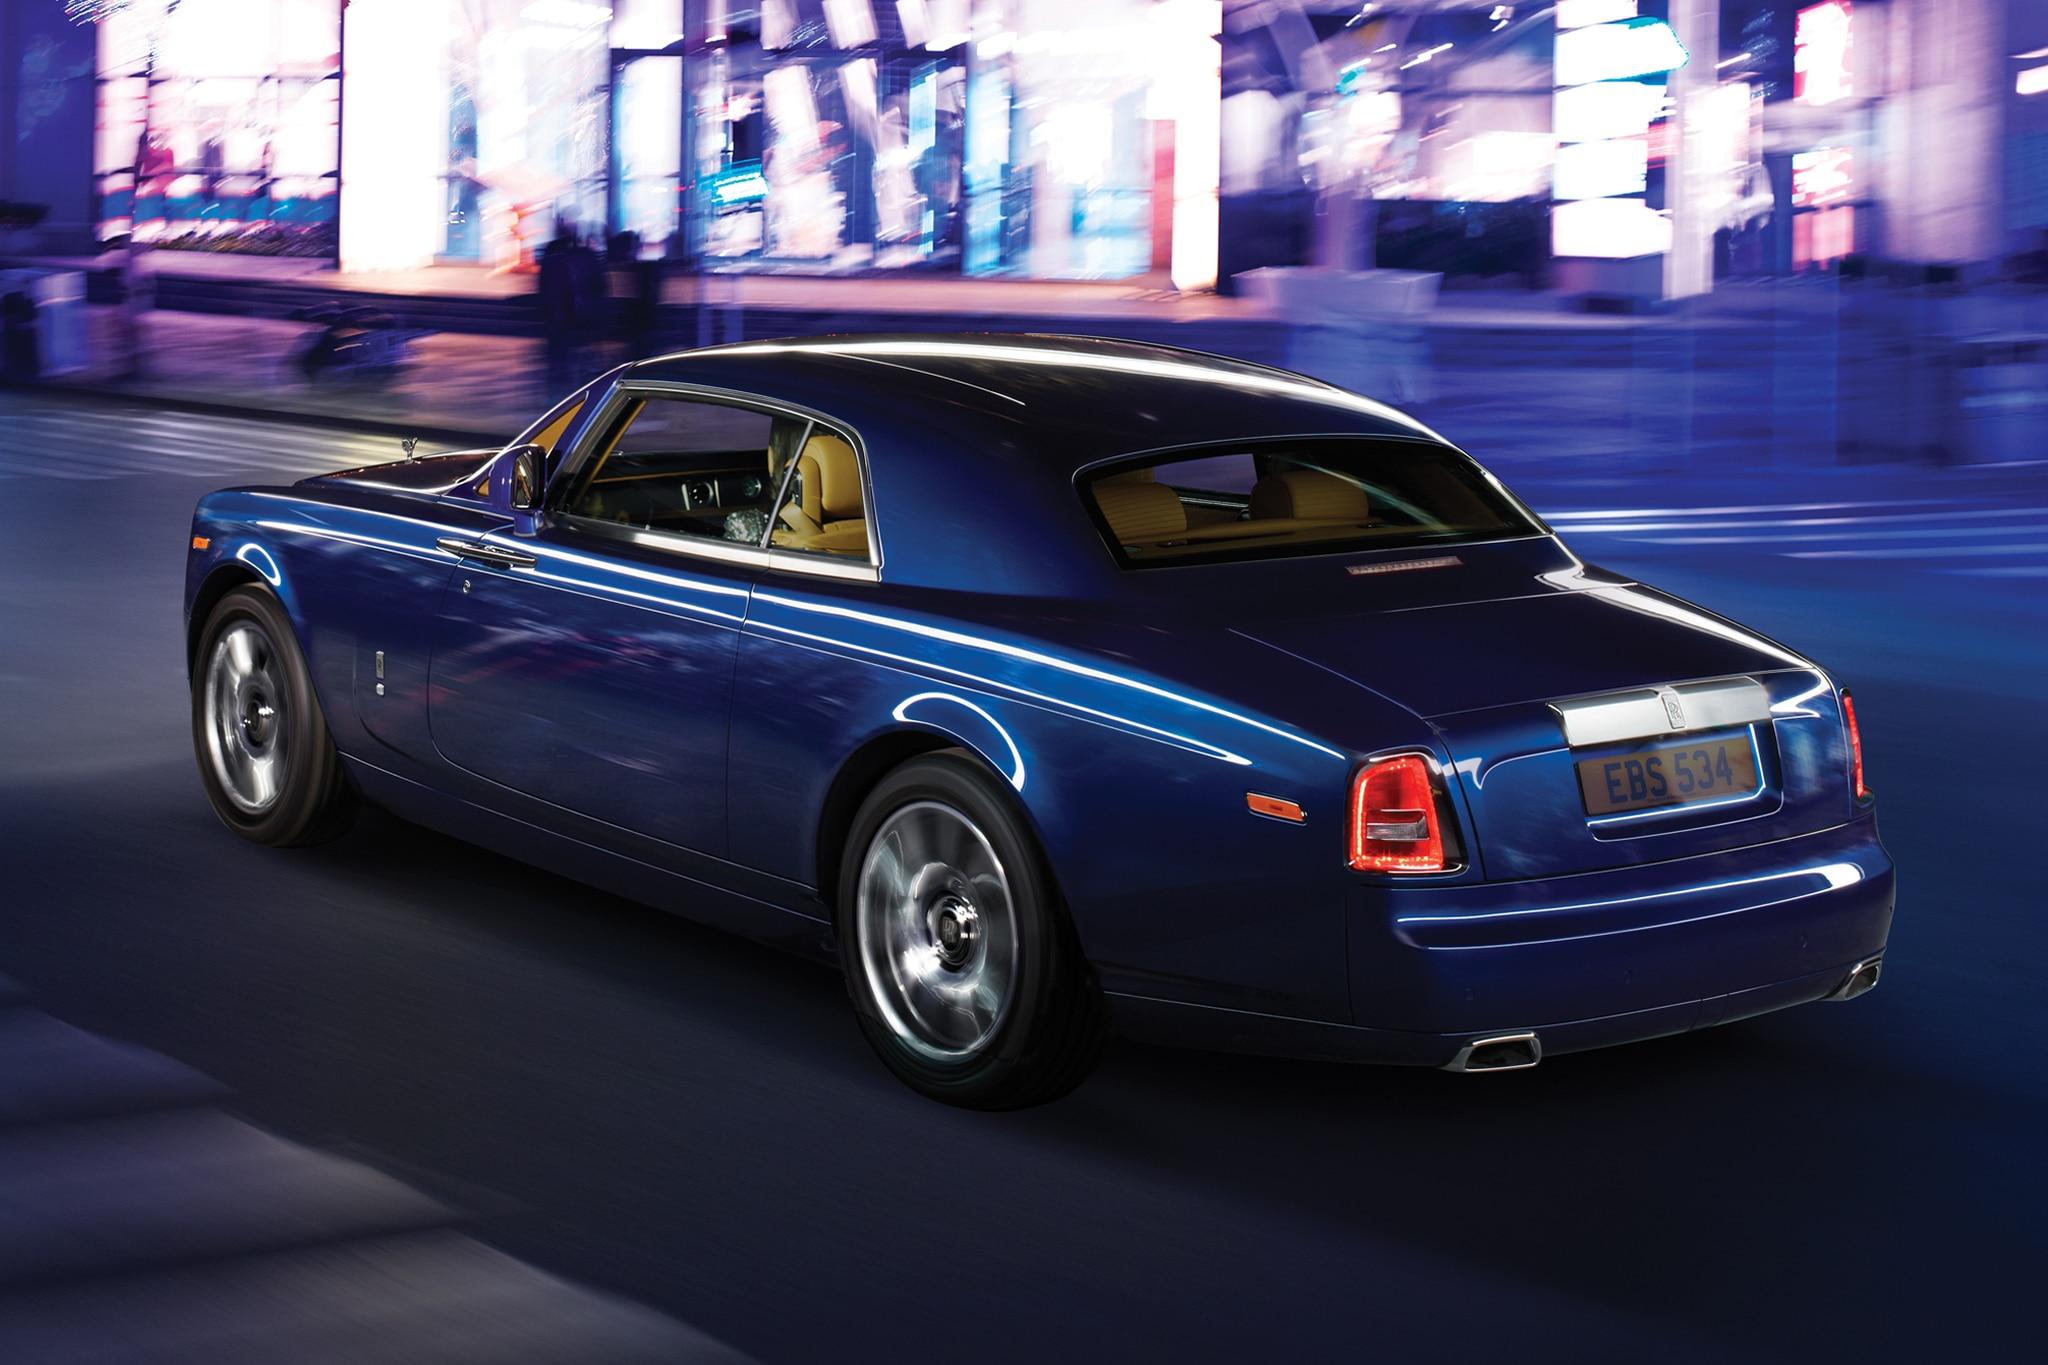 rolls royce phantom coupe - photo #35